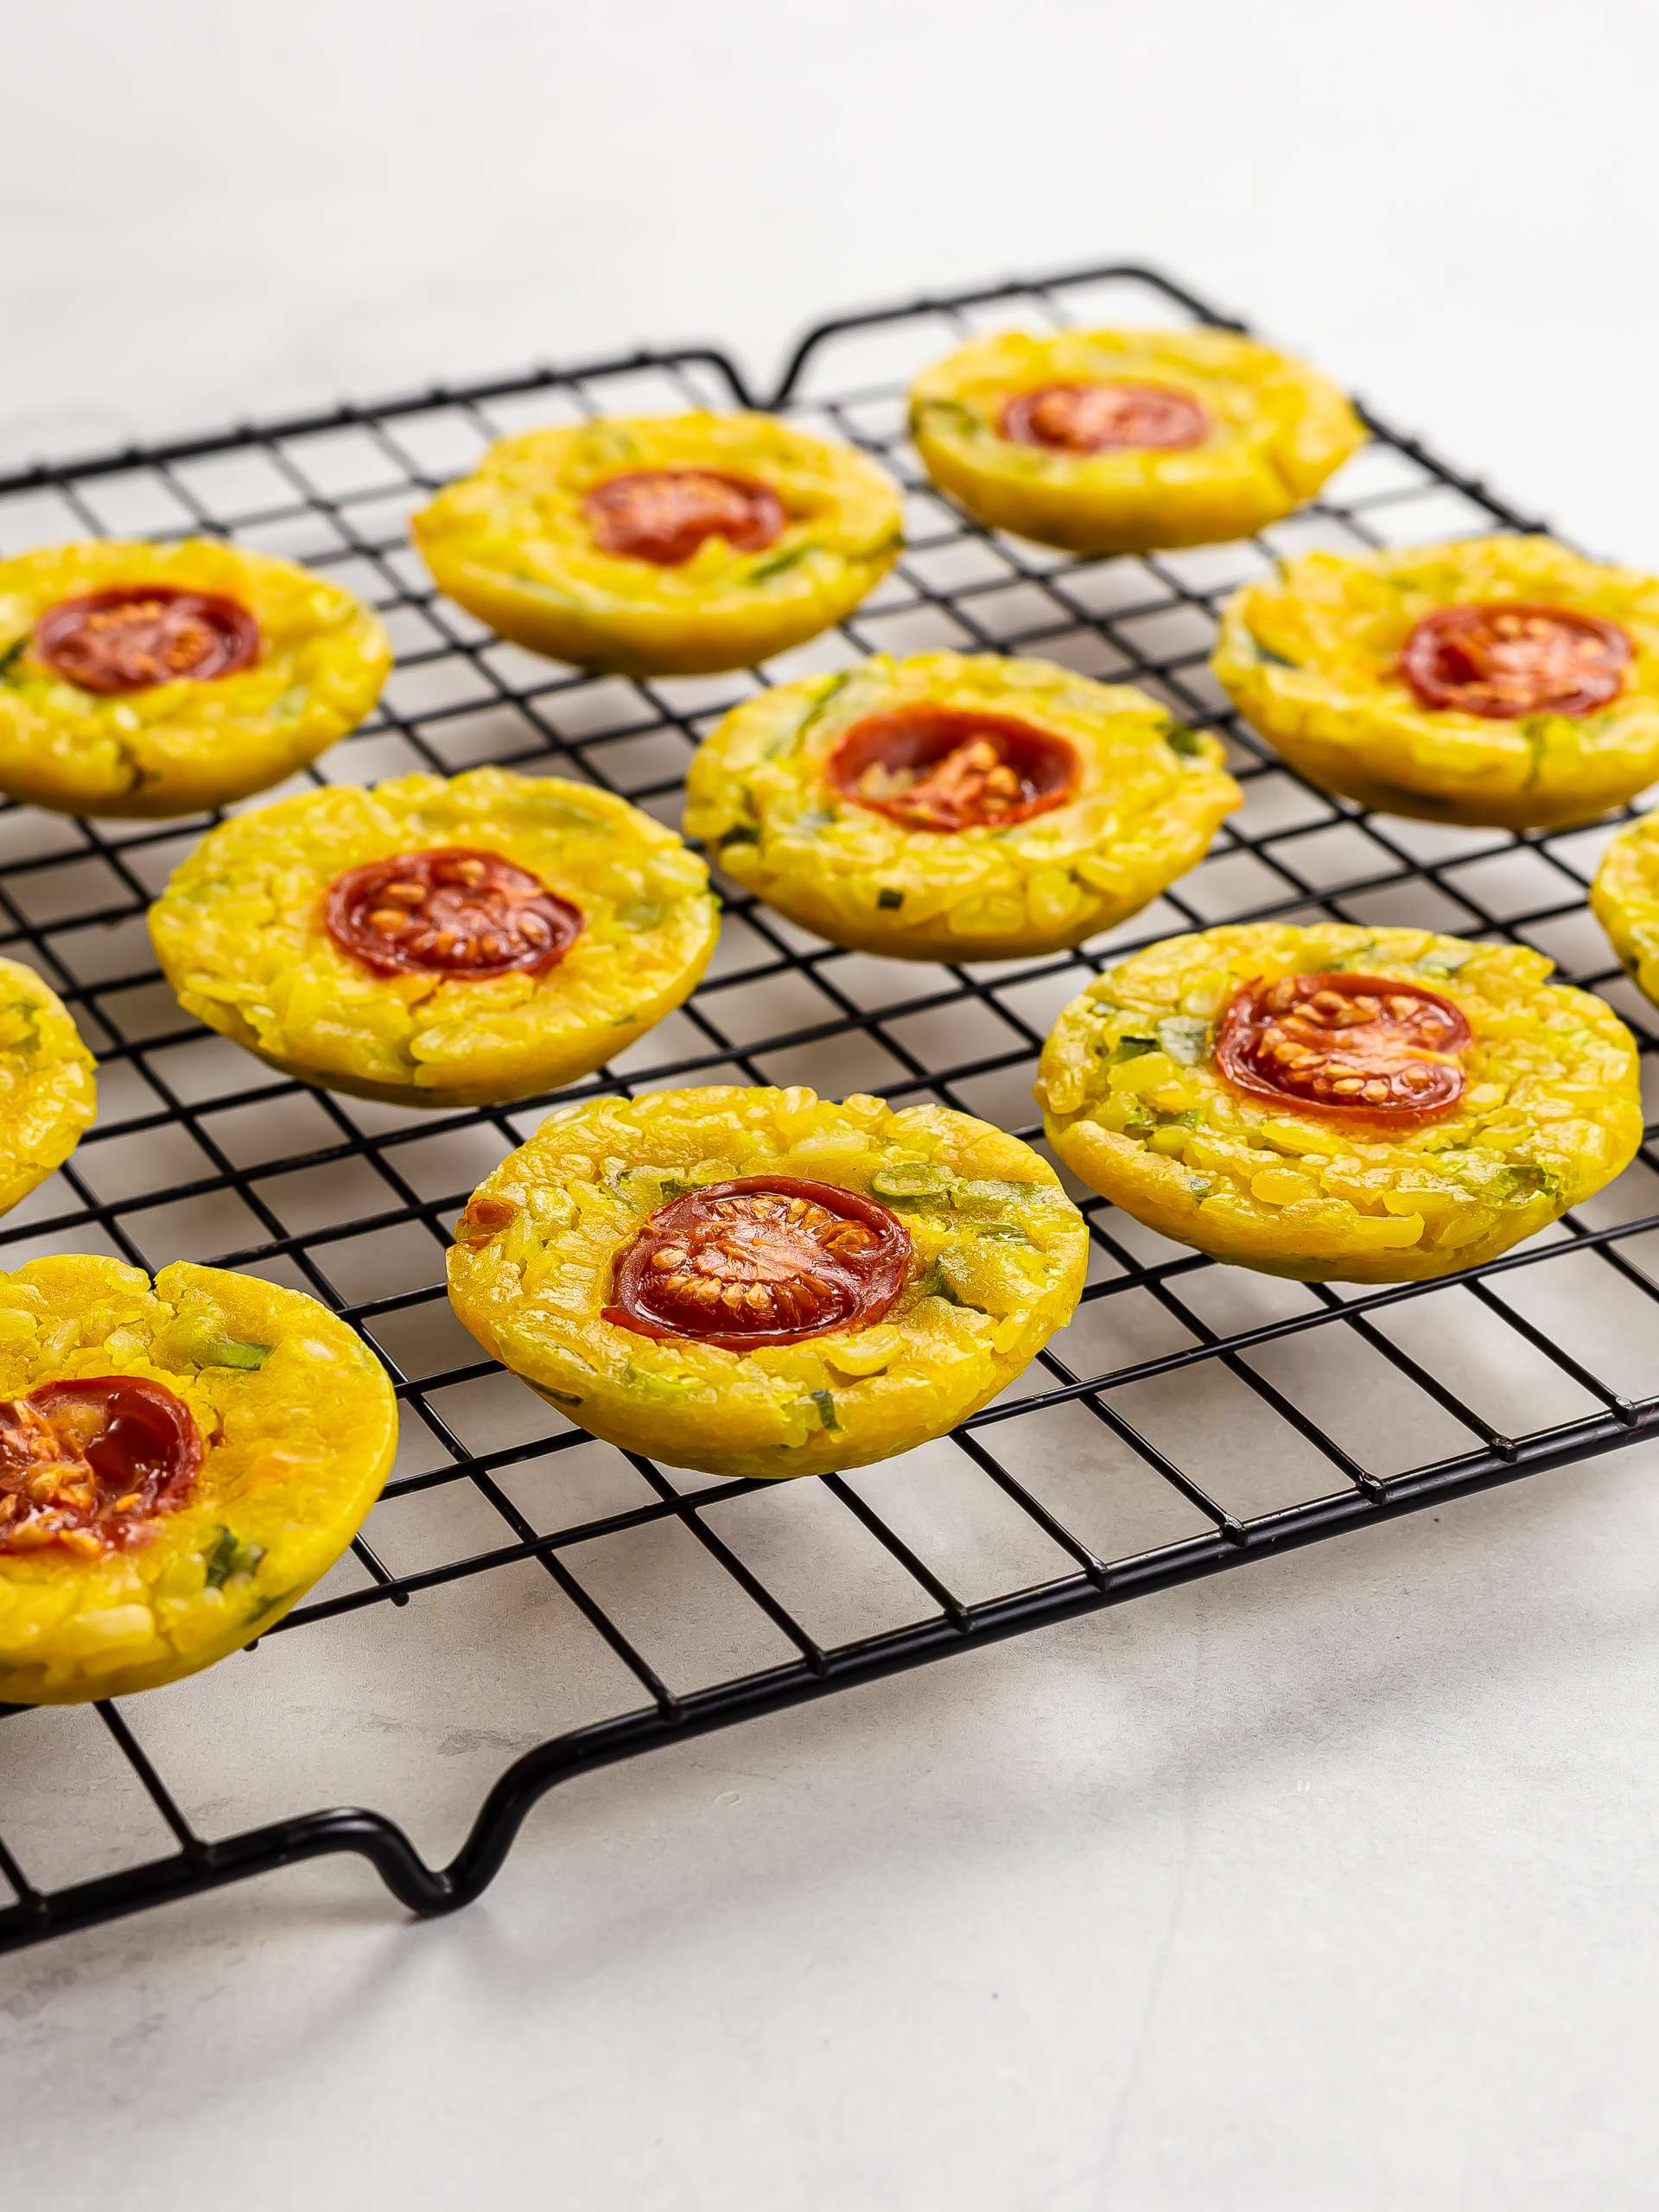 bankh khot pancakes on a rack